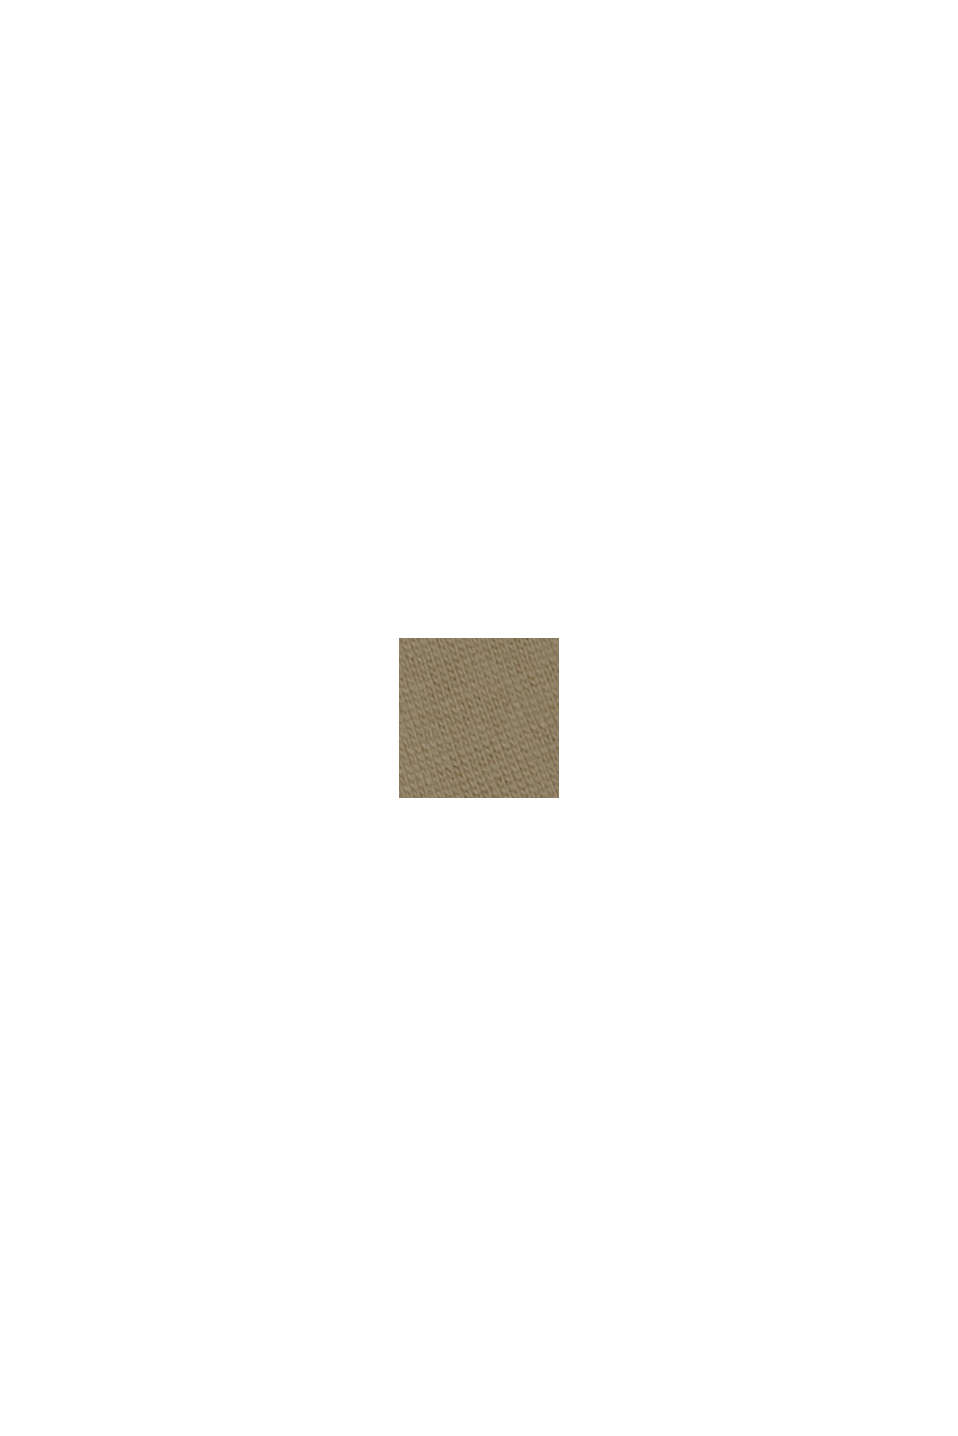 Jersey-Midikleid aus 100% Bio-Baumwolle, LIGHT KHAKI, swatch